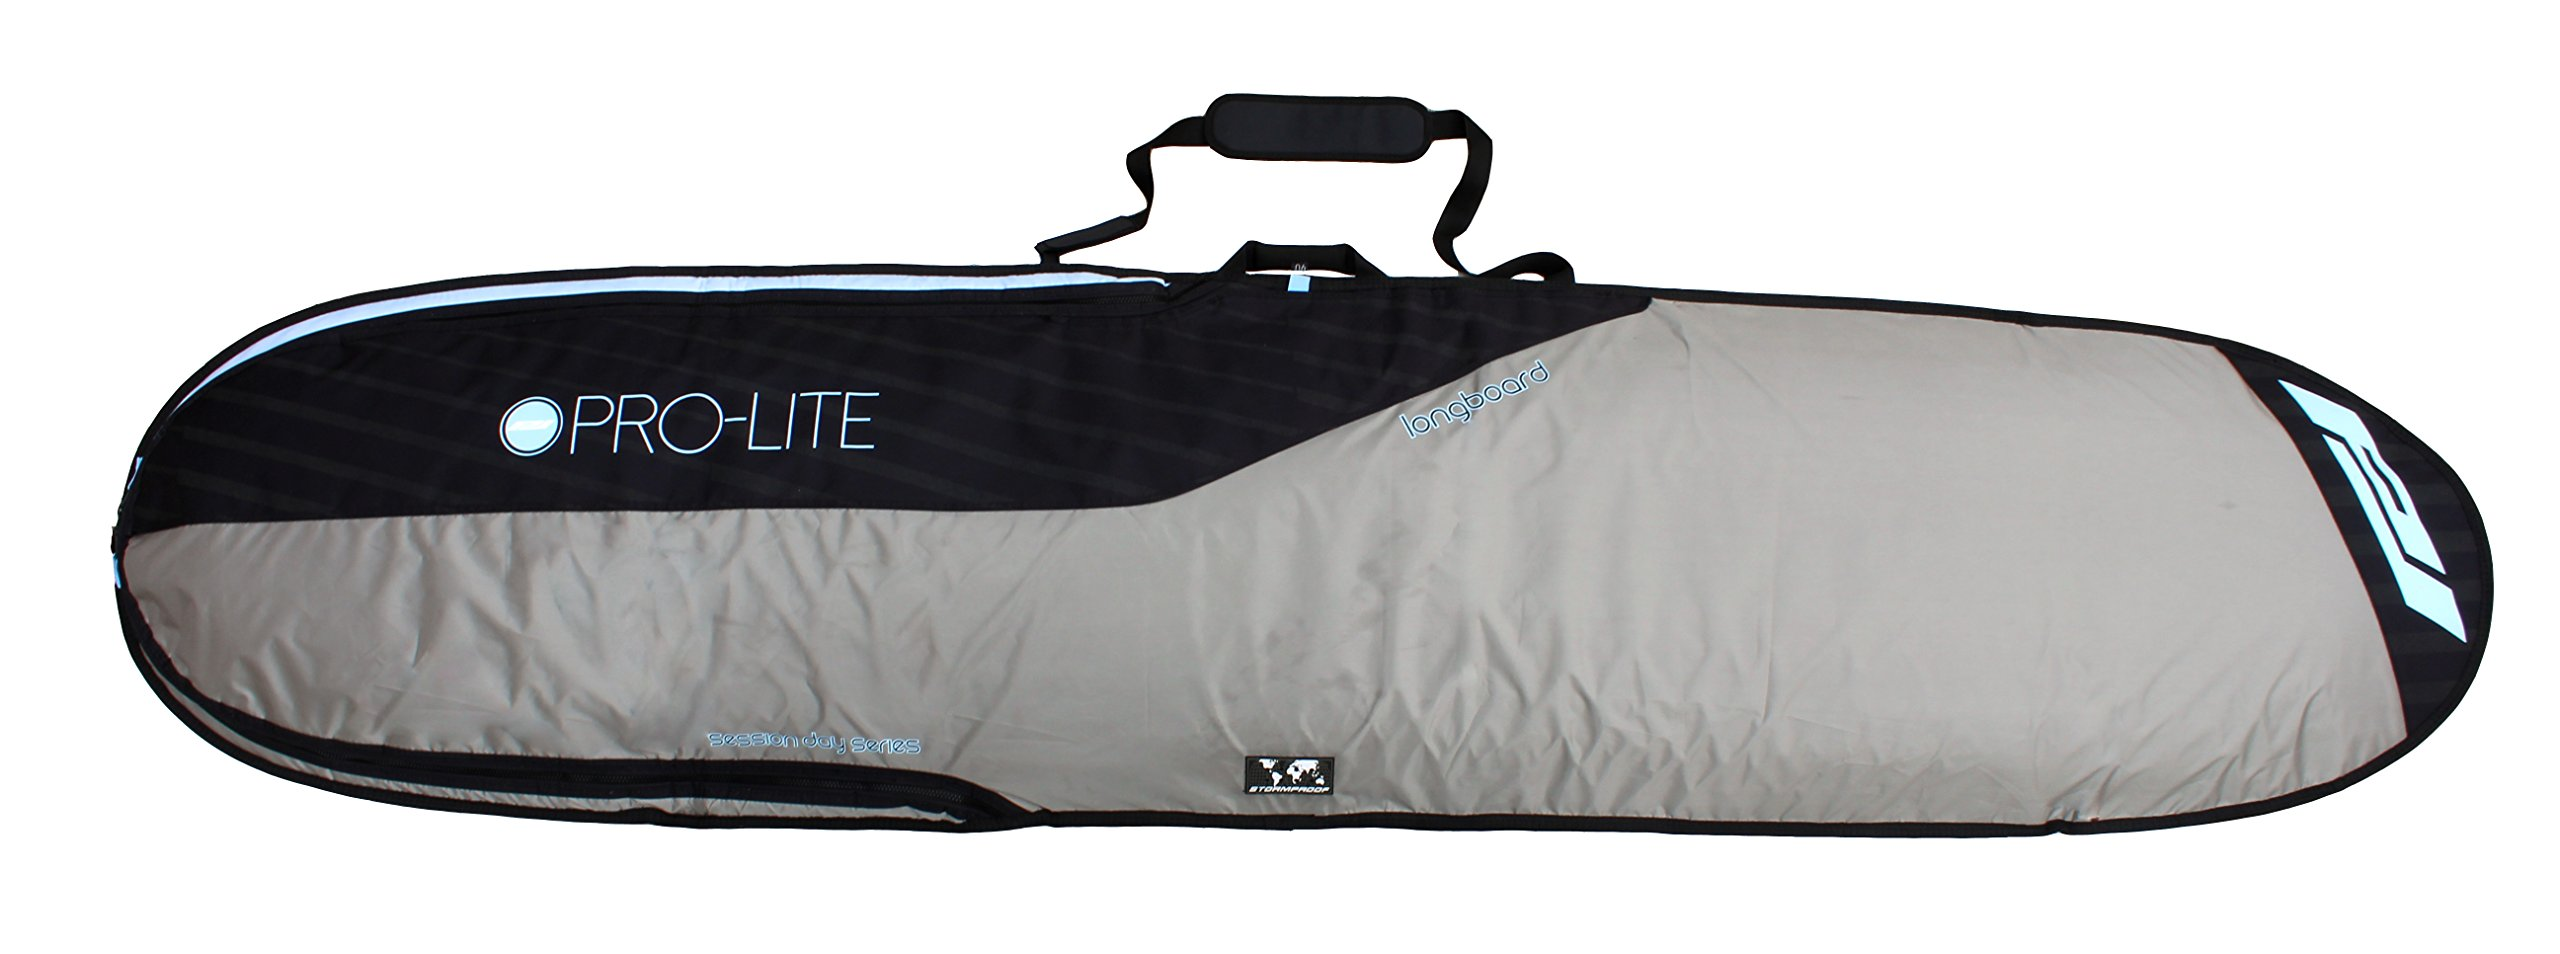 Pro-Lite Session Longboard Day Bag 9'0